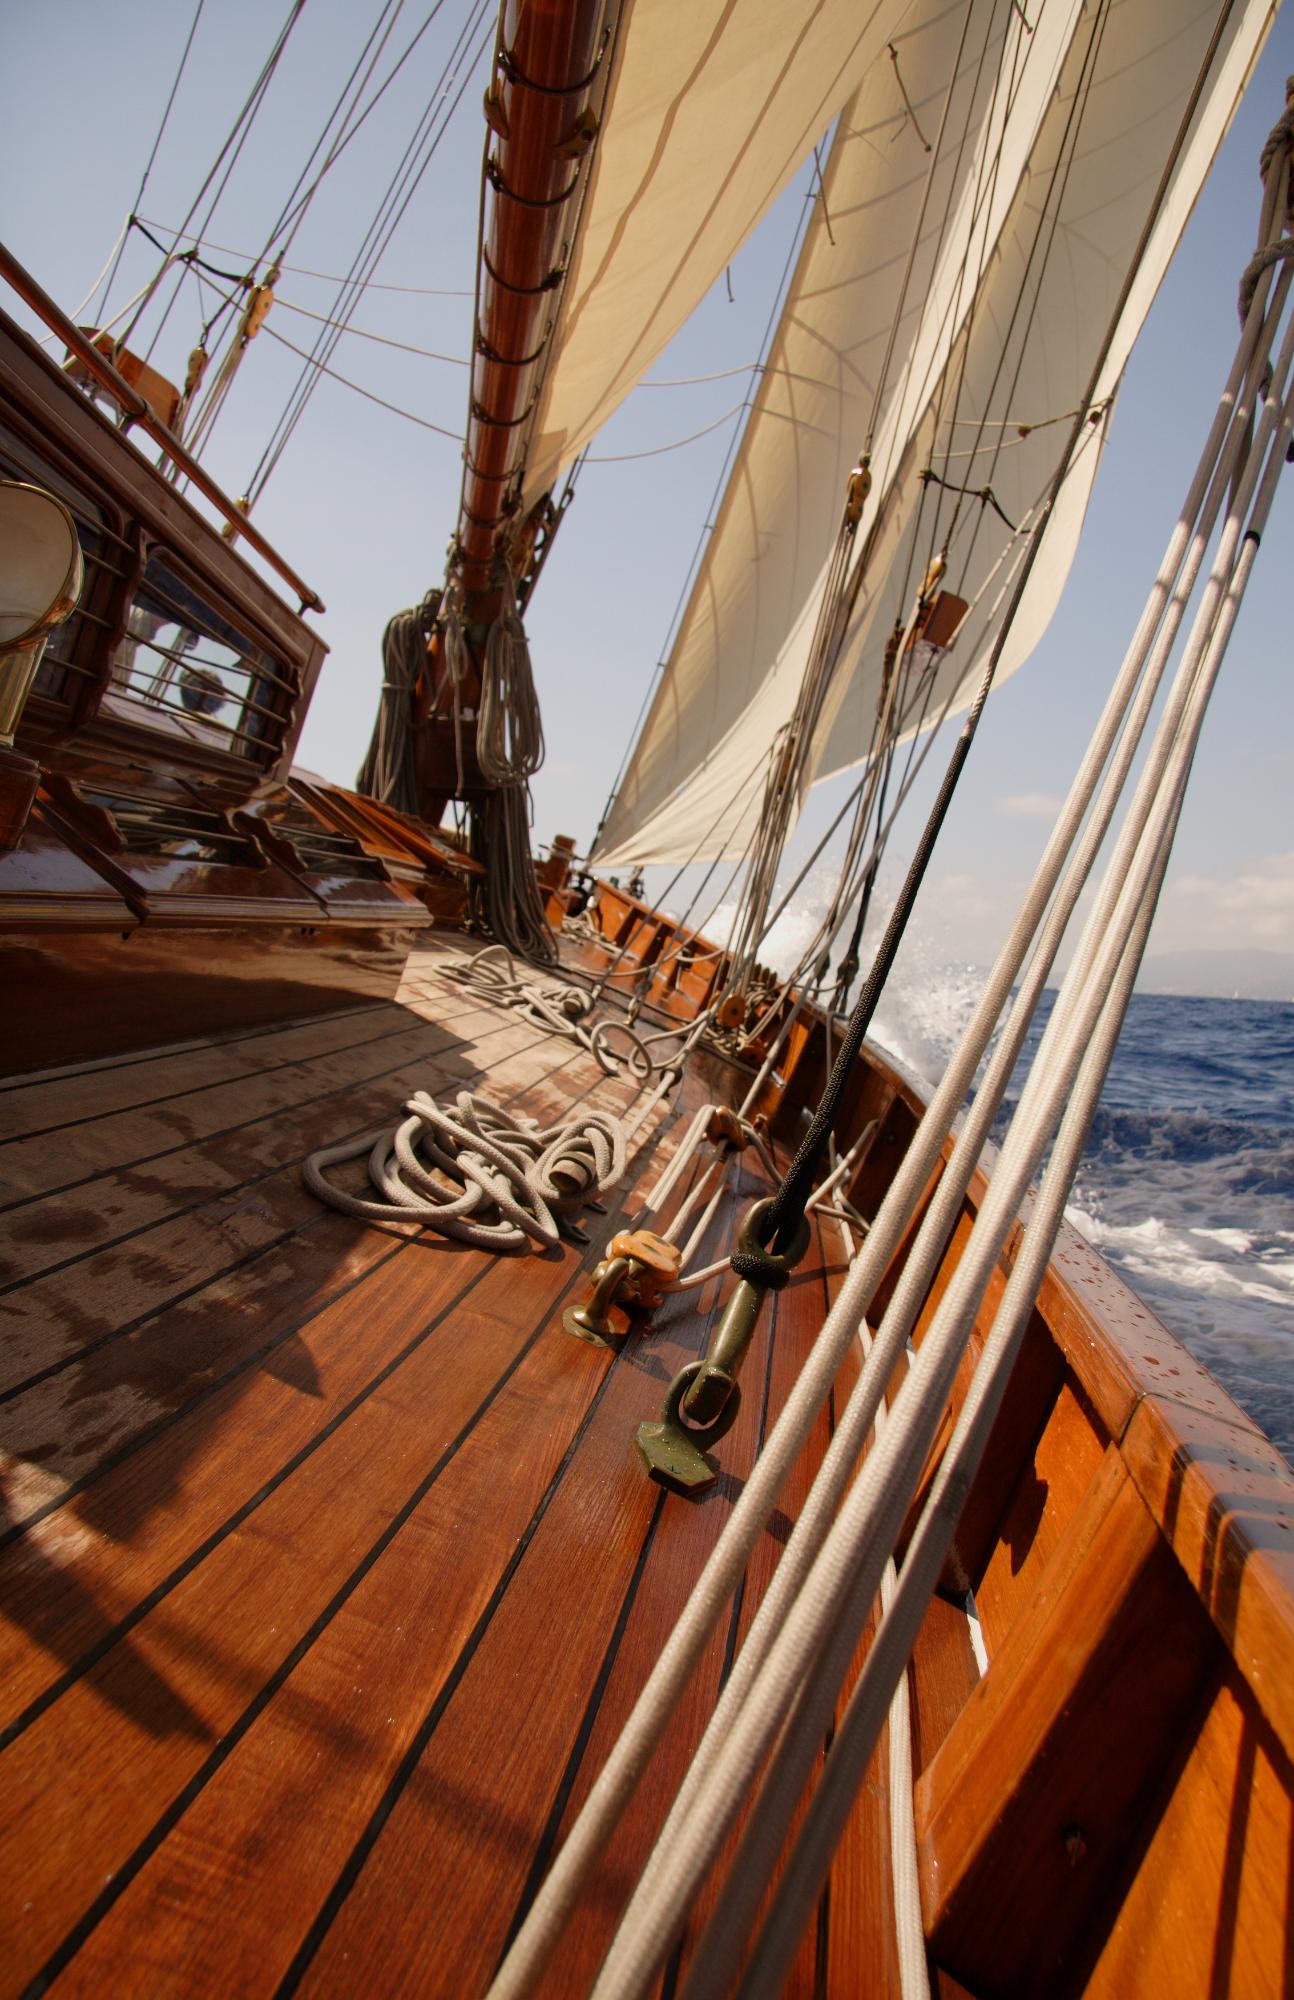 Aboard a Sailboat